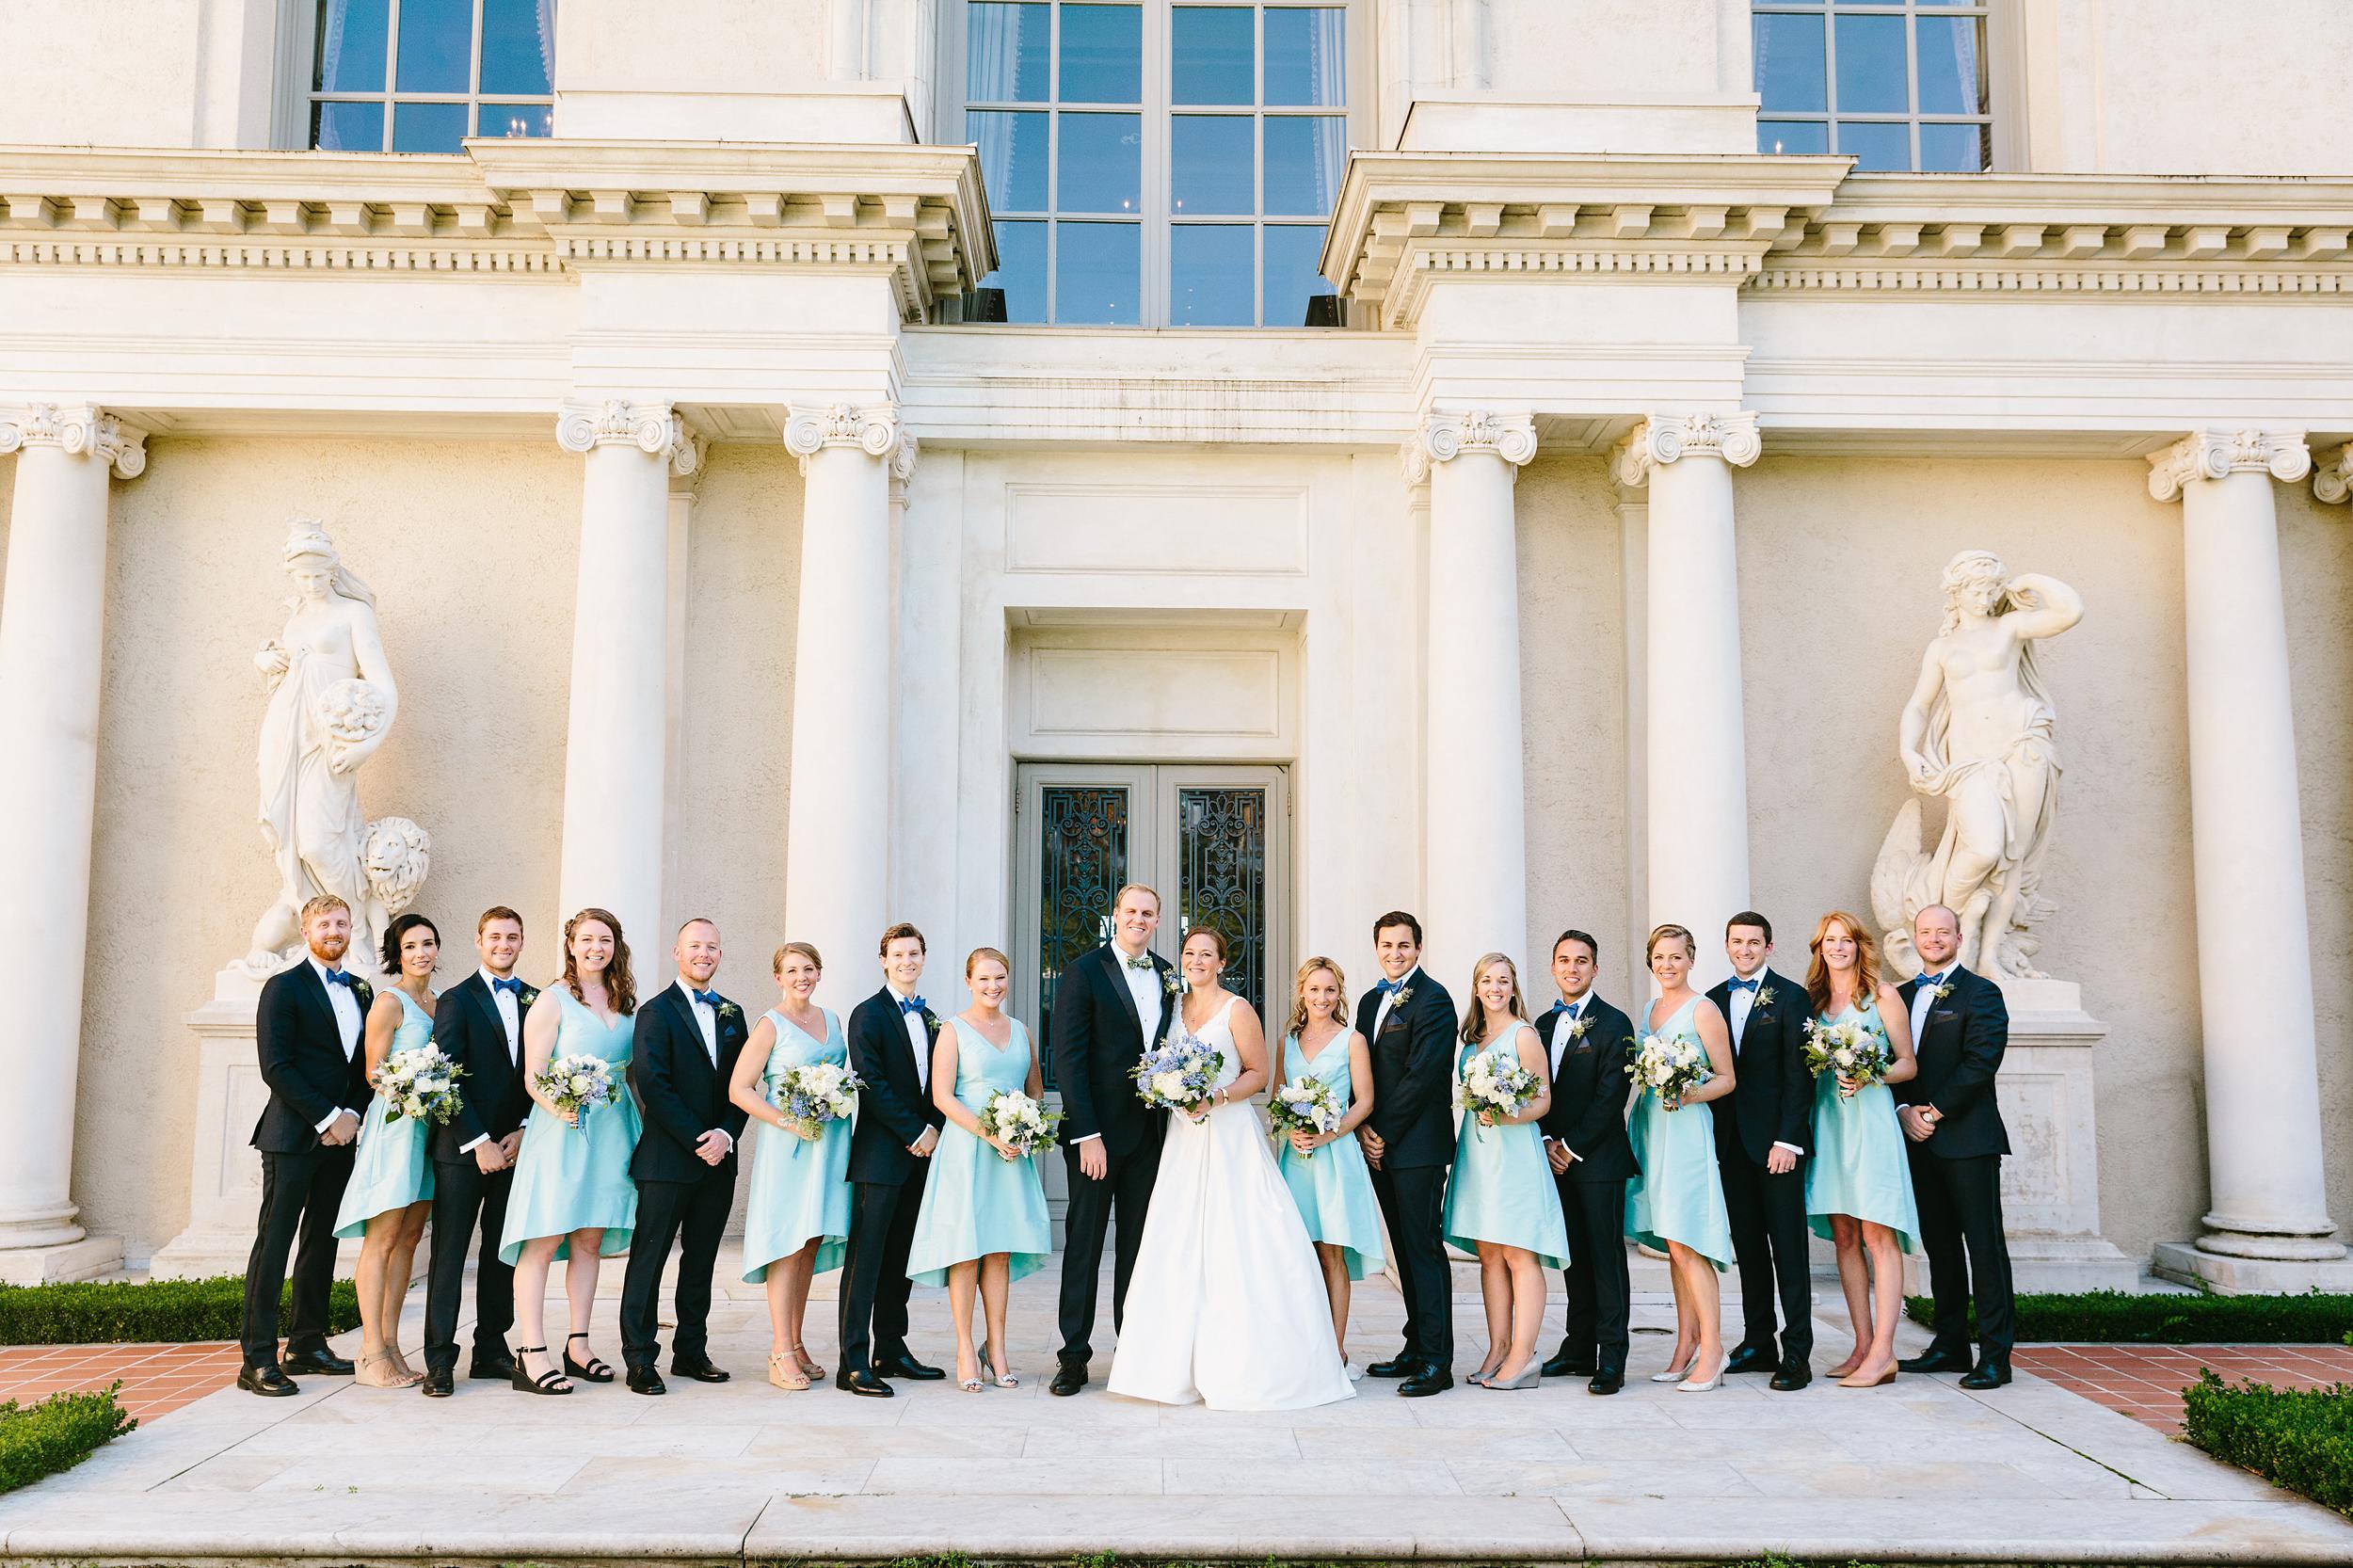 huntington-library-wedding-HP-17.jpg